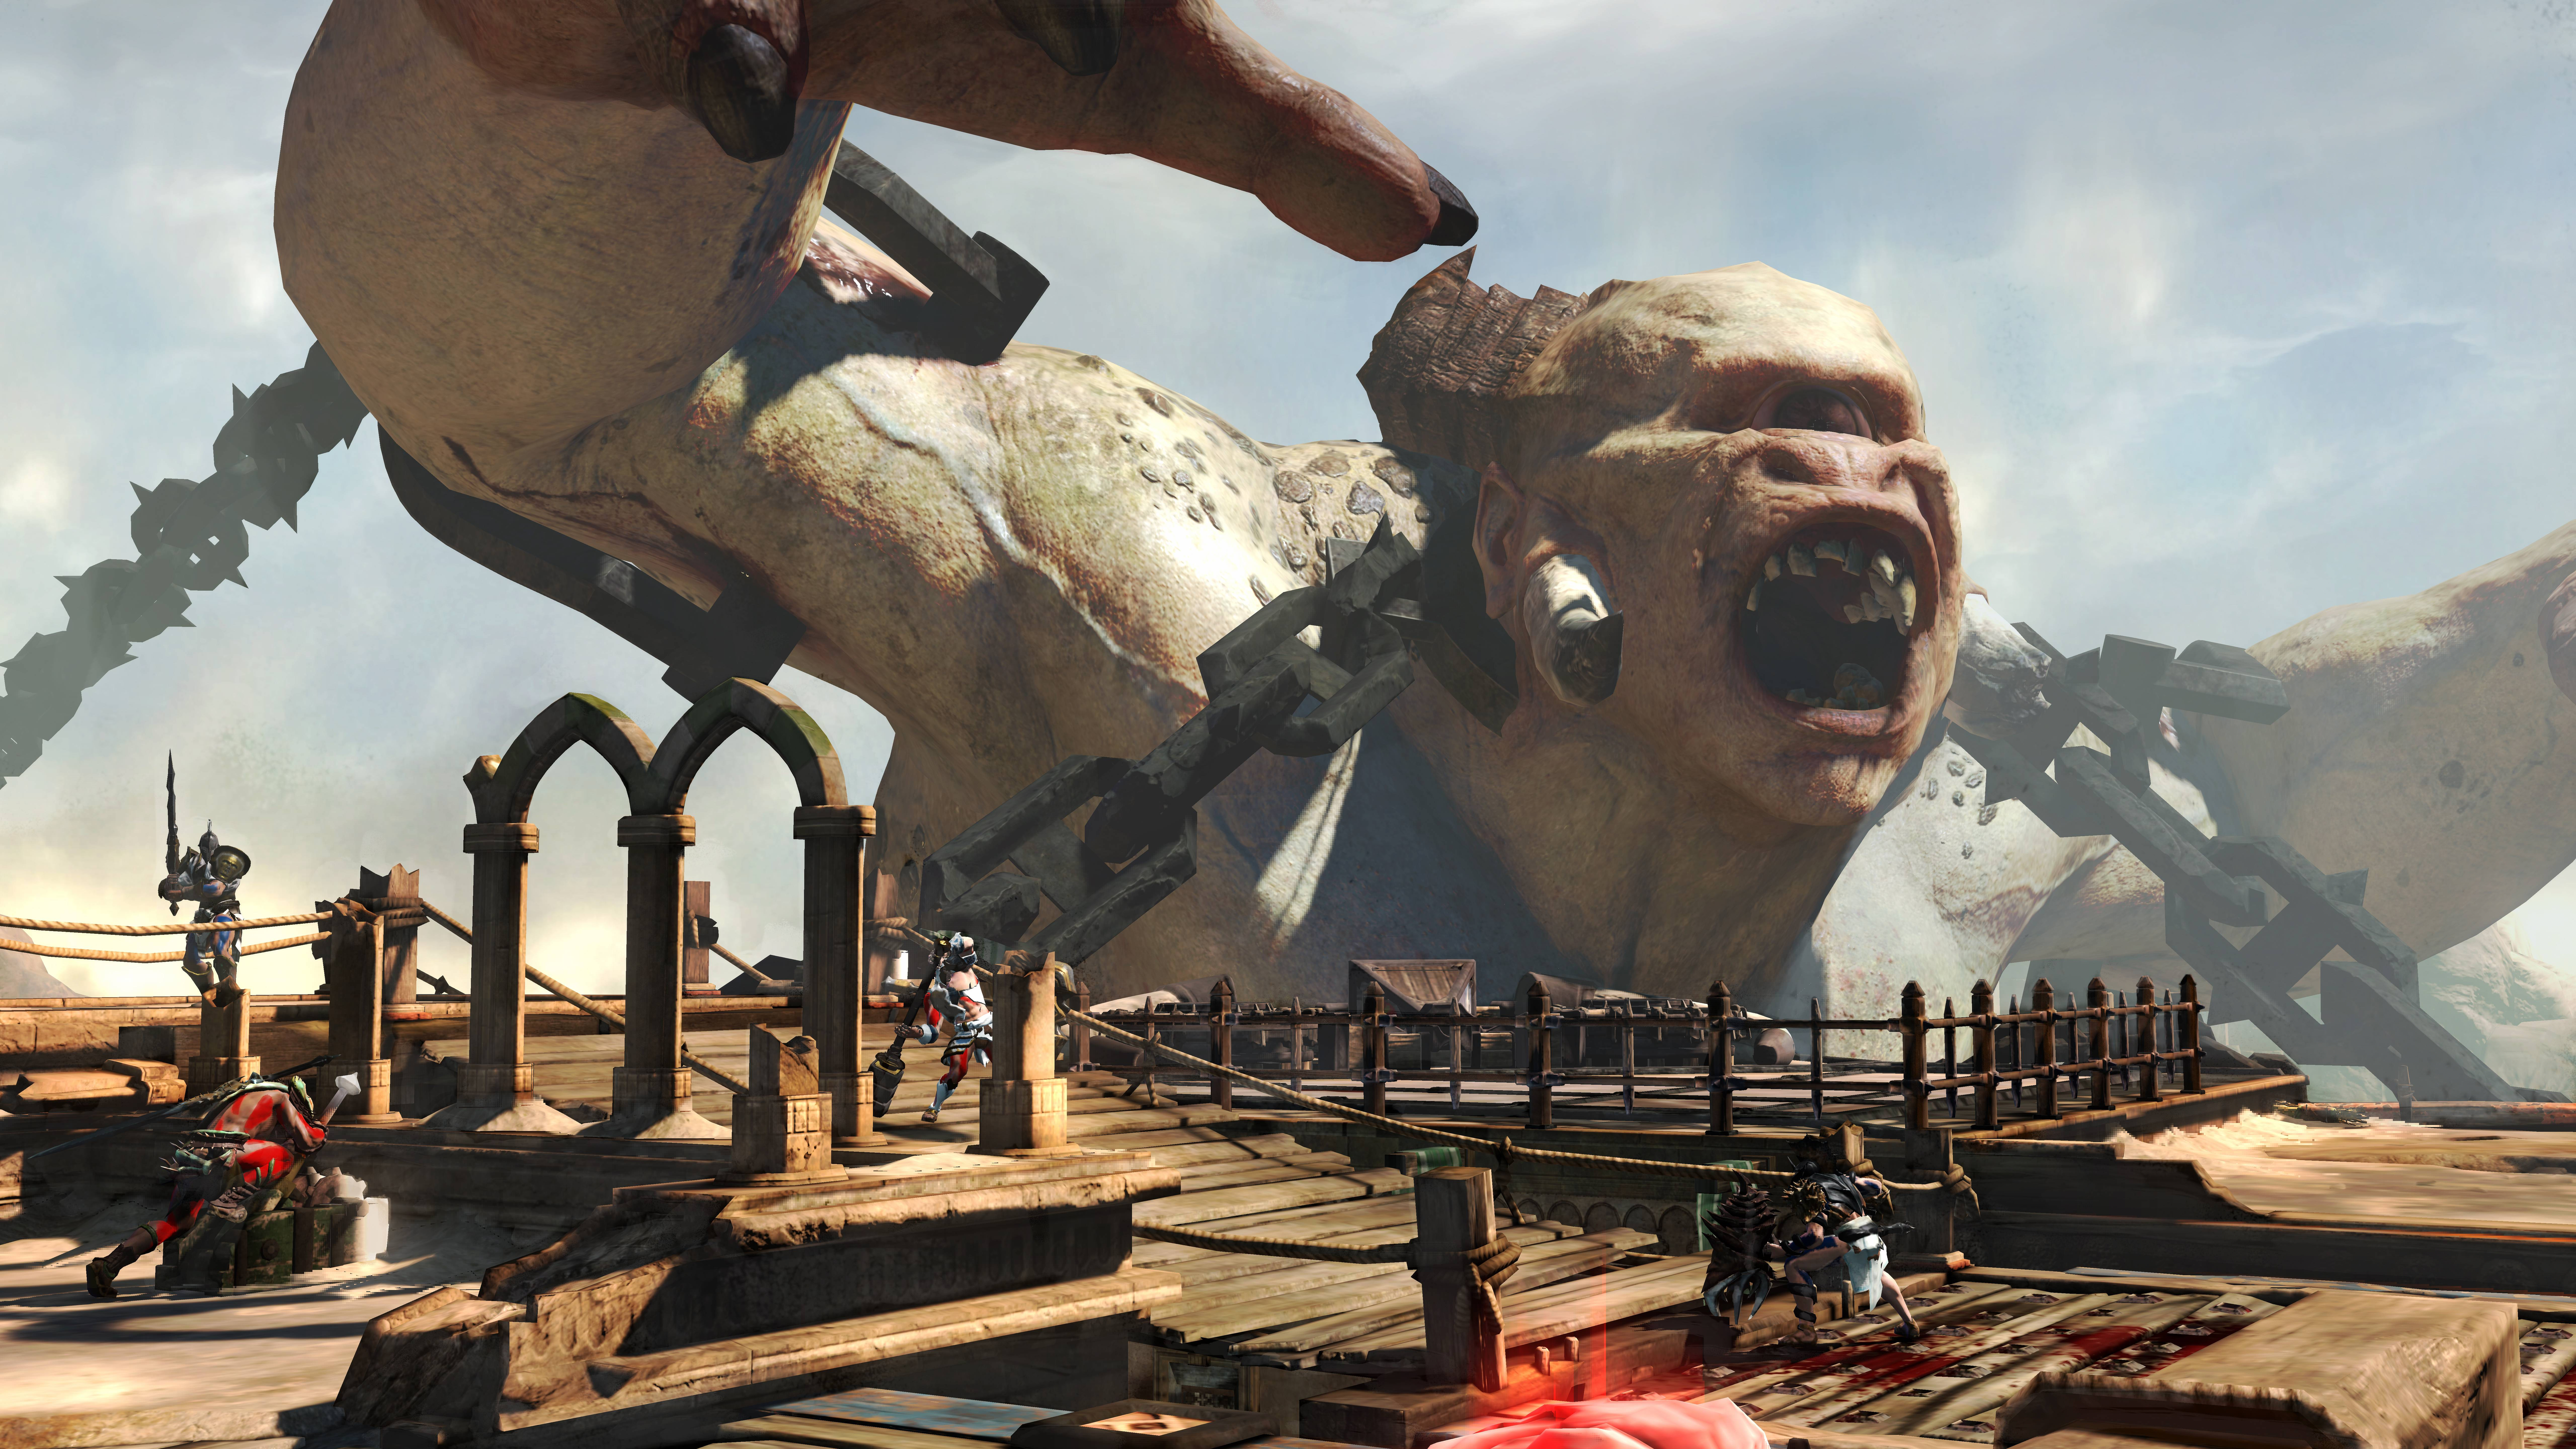 God of War: Ascension - God of War: Ascension 10K